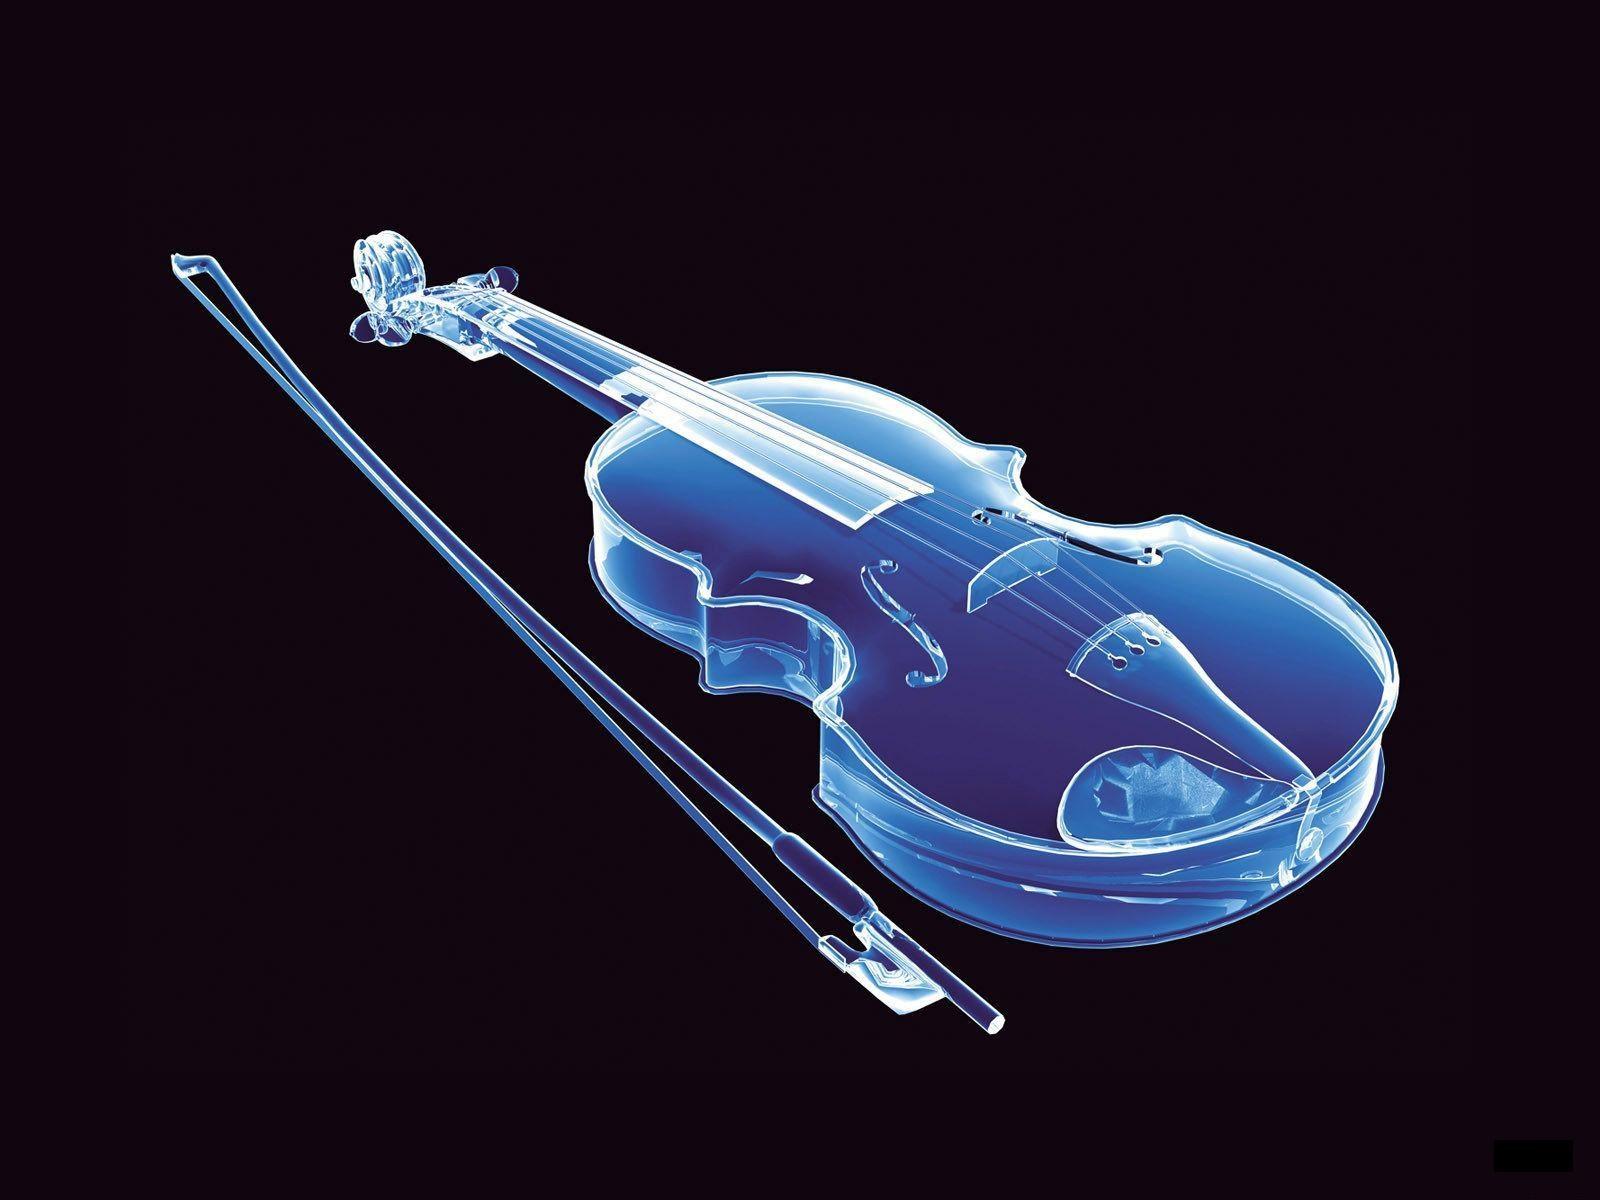 http://2.bp.blogspot.com/-uQ-69OkProA/T6v0Jn1O91I/AAAAAAAABxs/wP8dzWu2wOA/s1600/3d_music_wallpaper_glass_violin-1600x1200.jpg